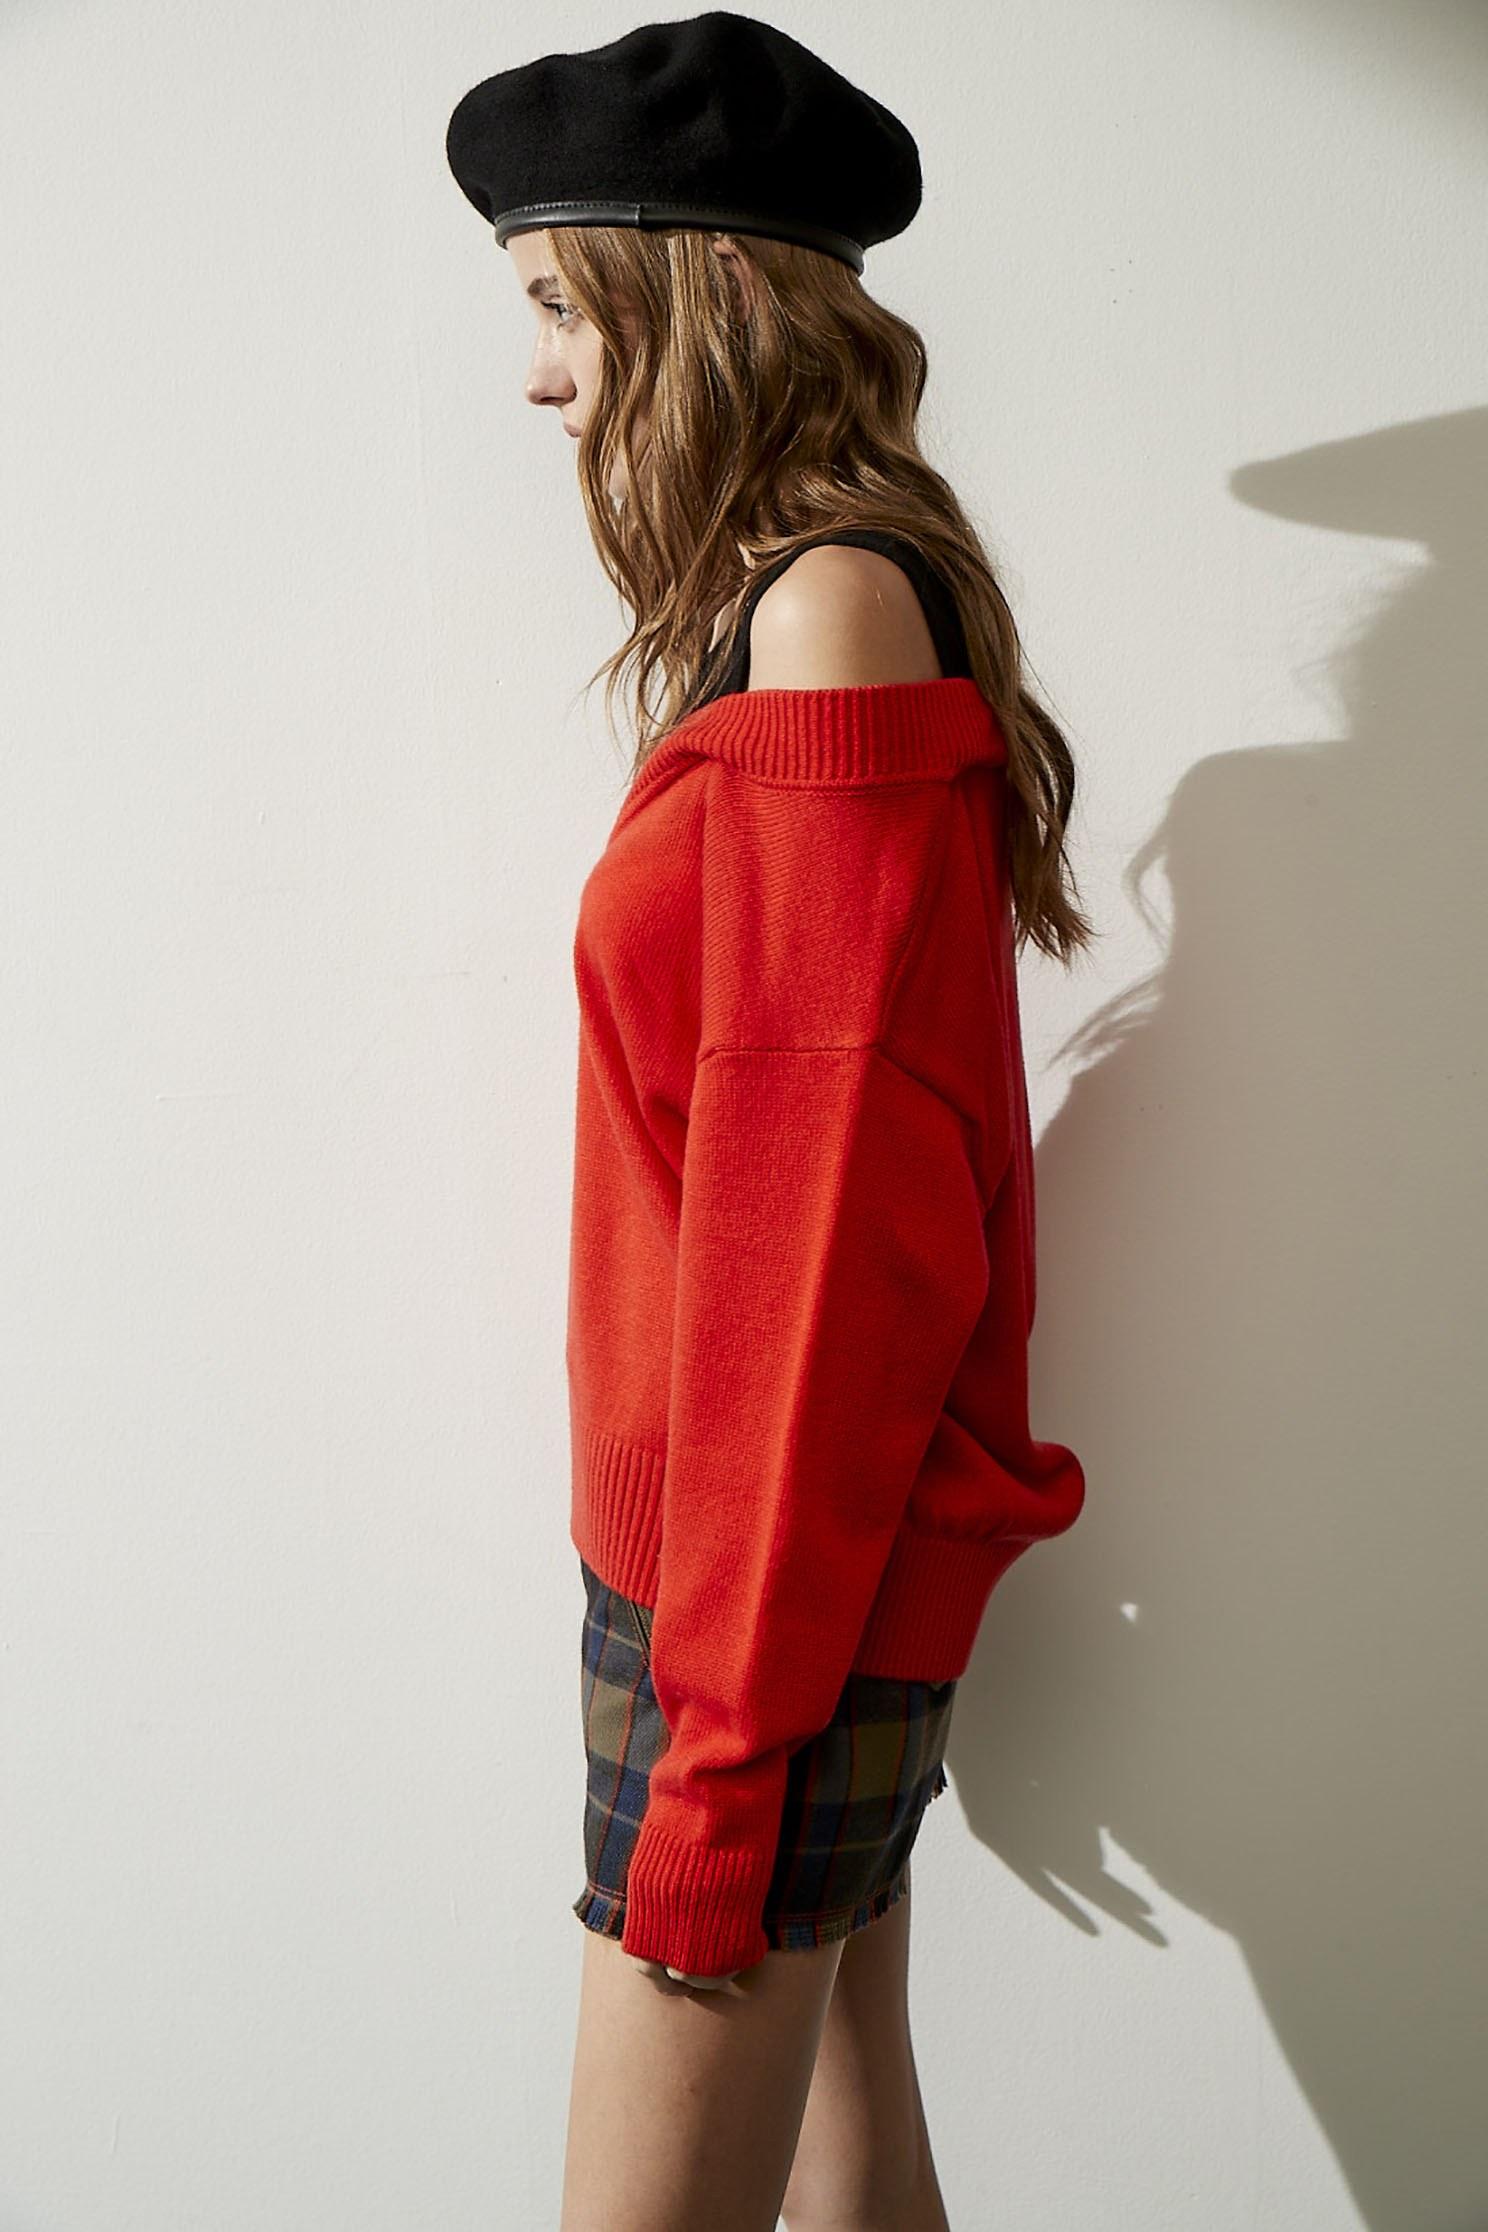 COMBINED KNIT SWEATER,shouldercuttop,knitting,knittedtop,knittedtop,longsleevetop